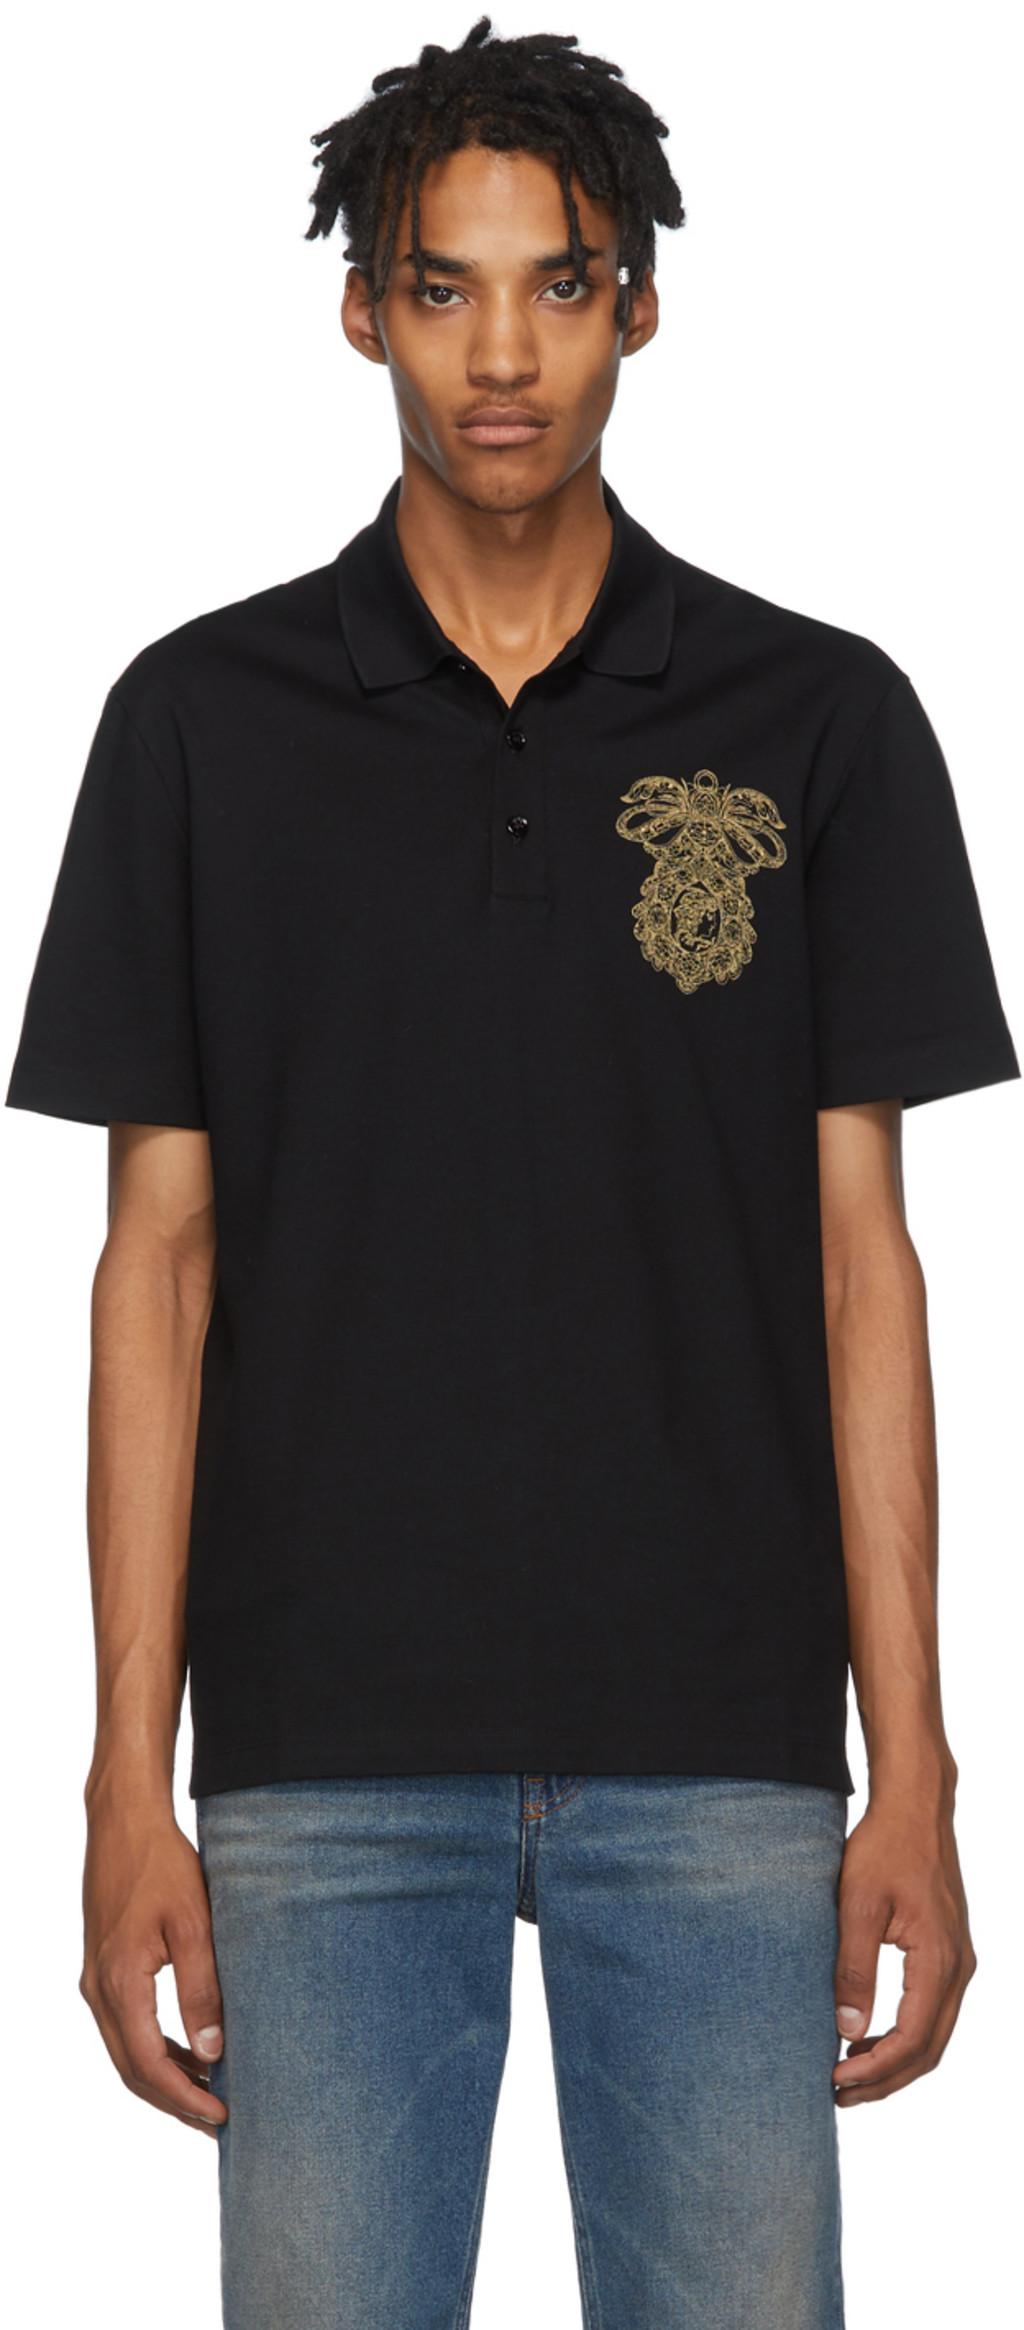 0c27dac7 Black Chest Crest Polo